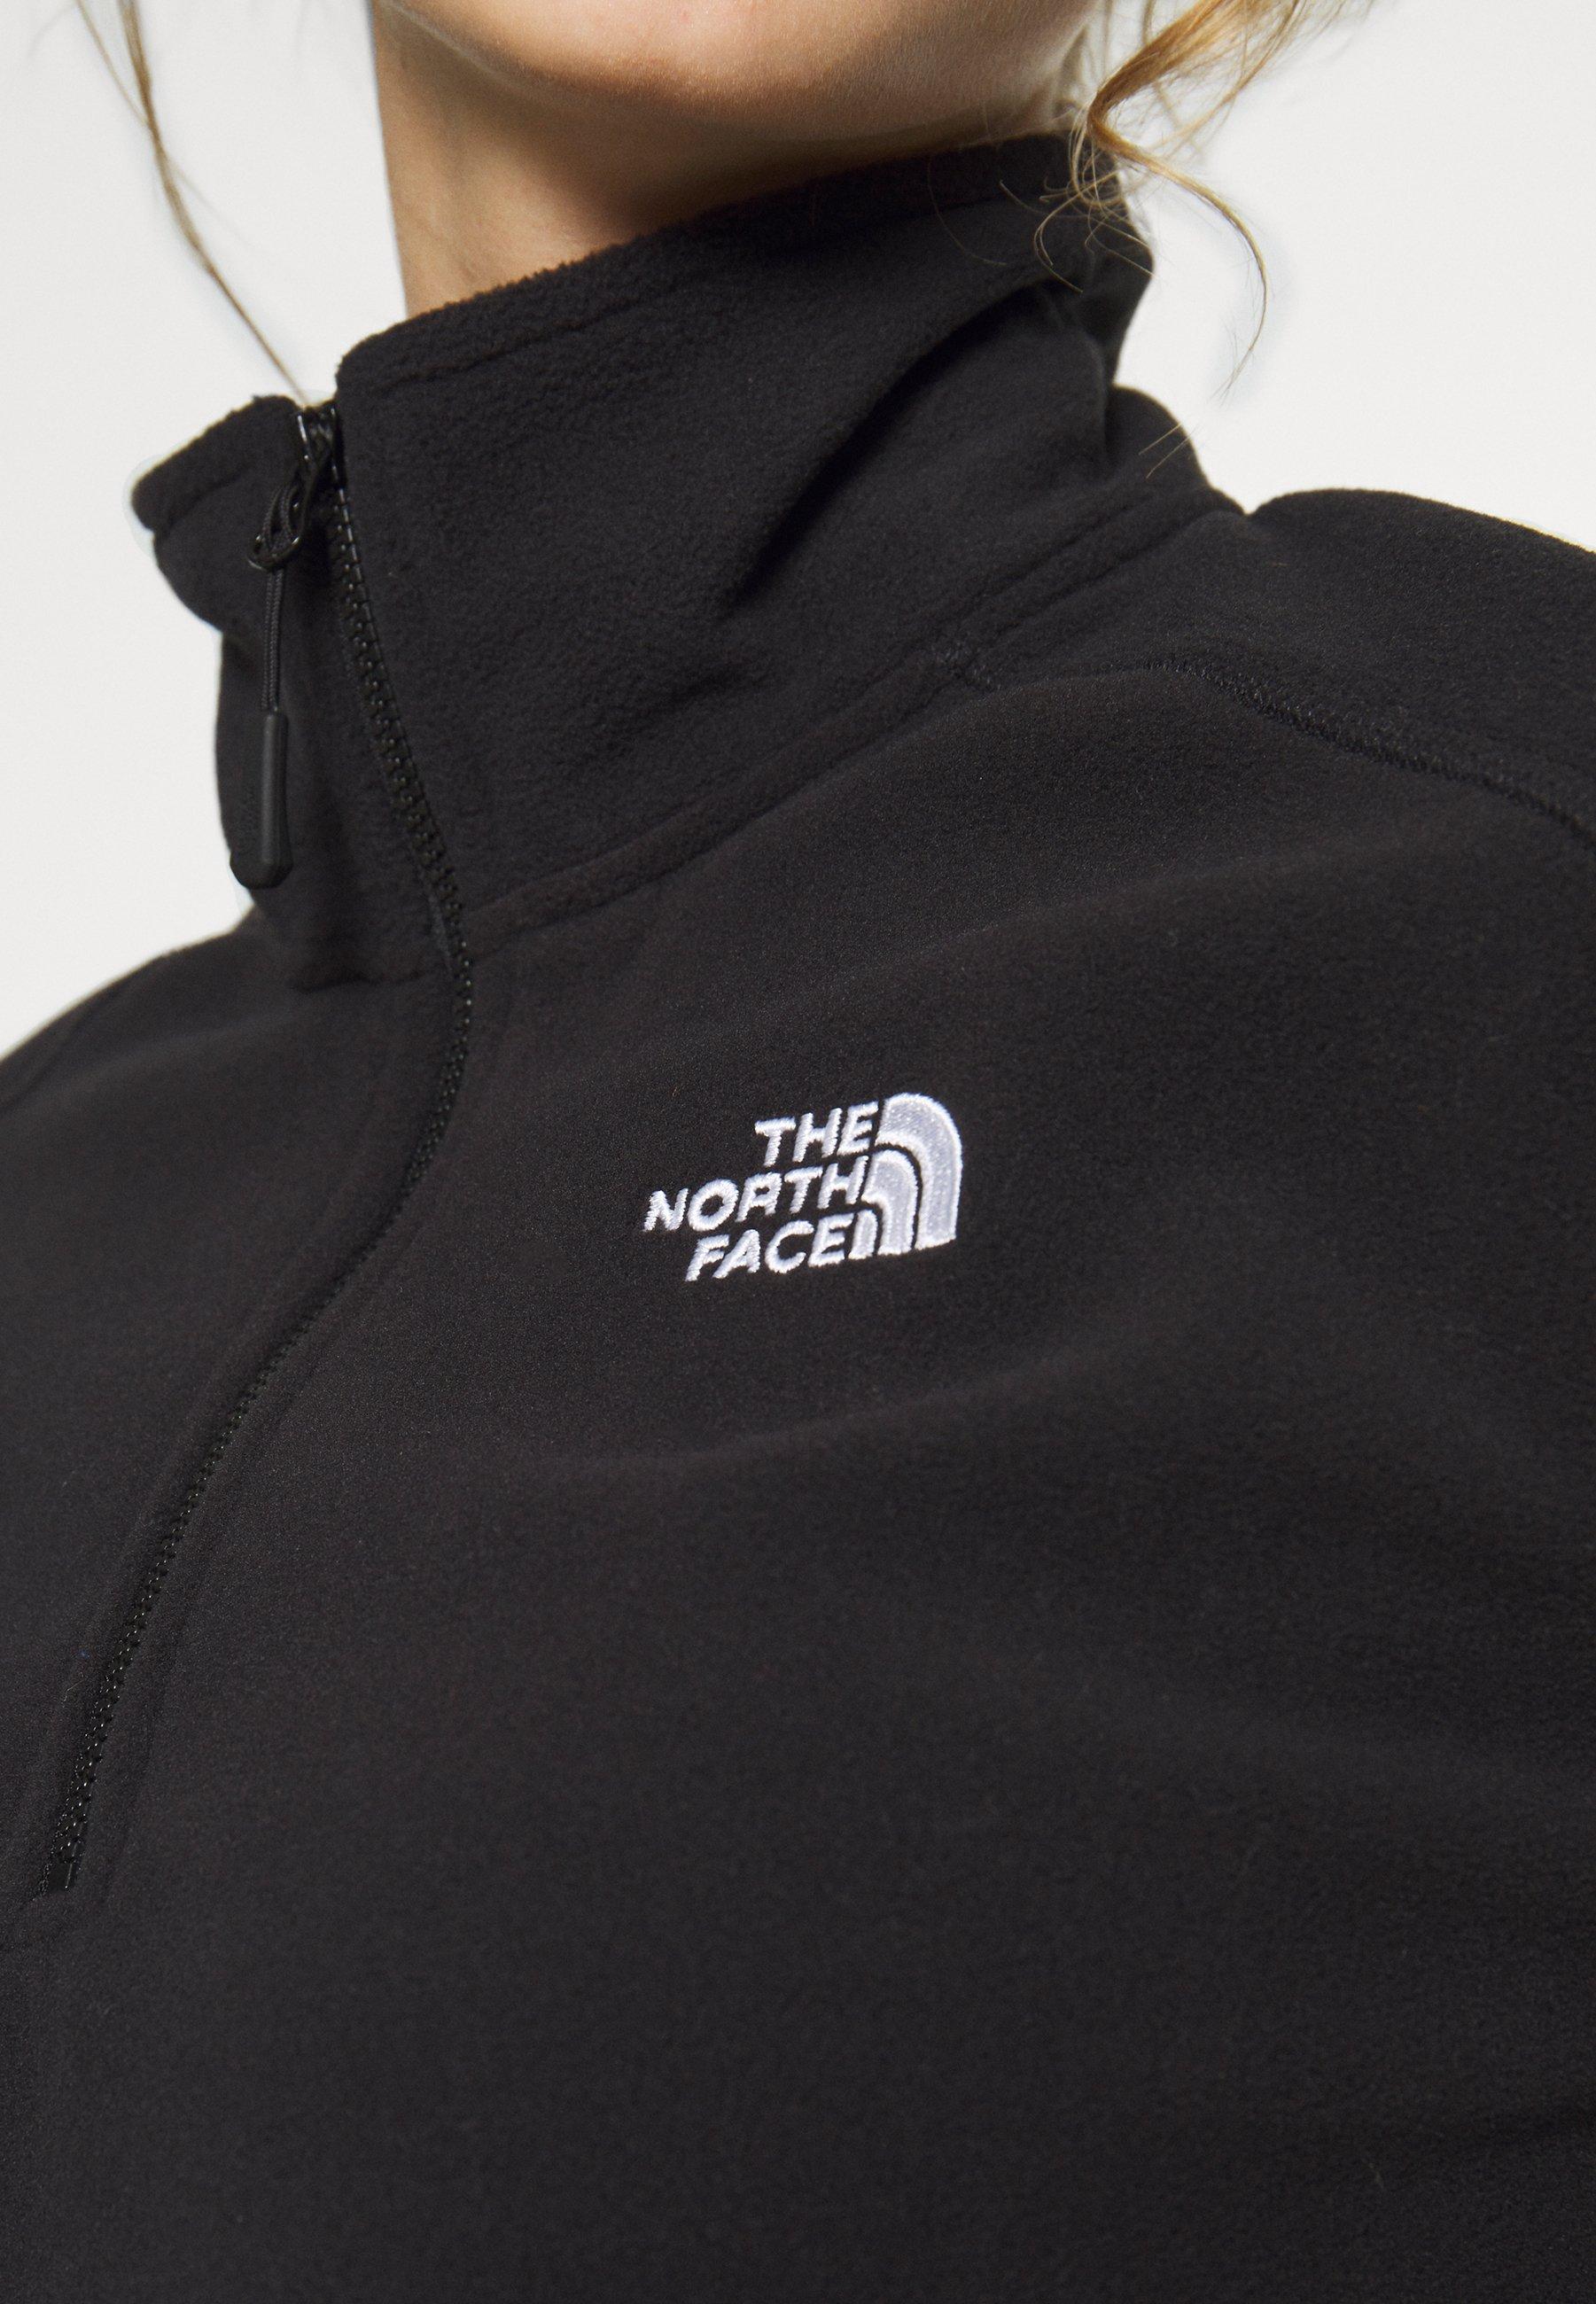 The North Face Glacier Cropped Zip - Sweat Polaire Black